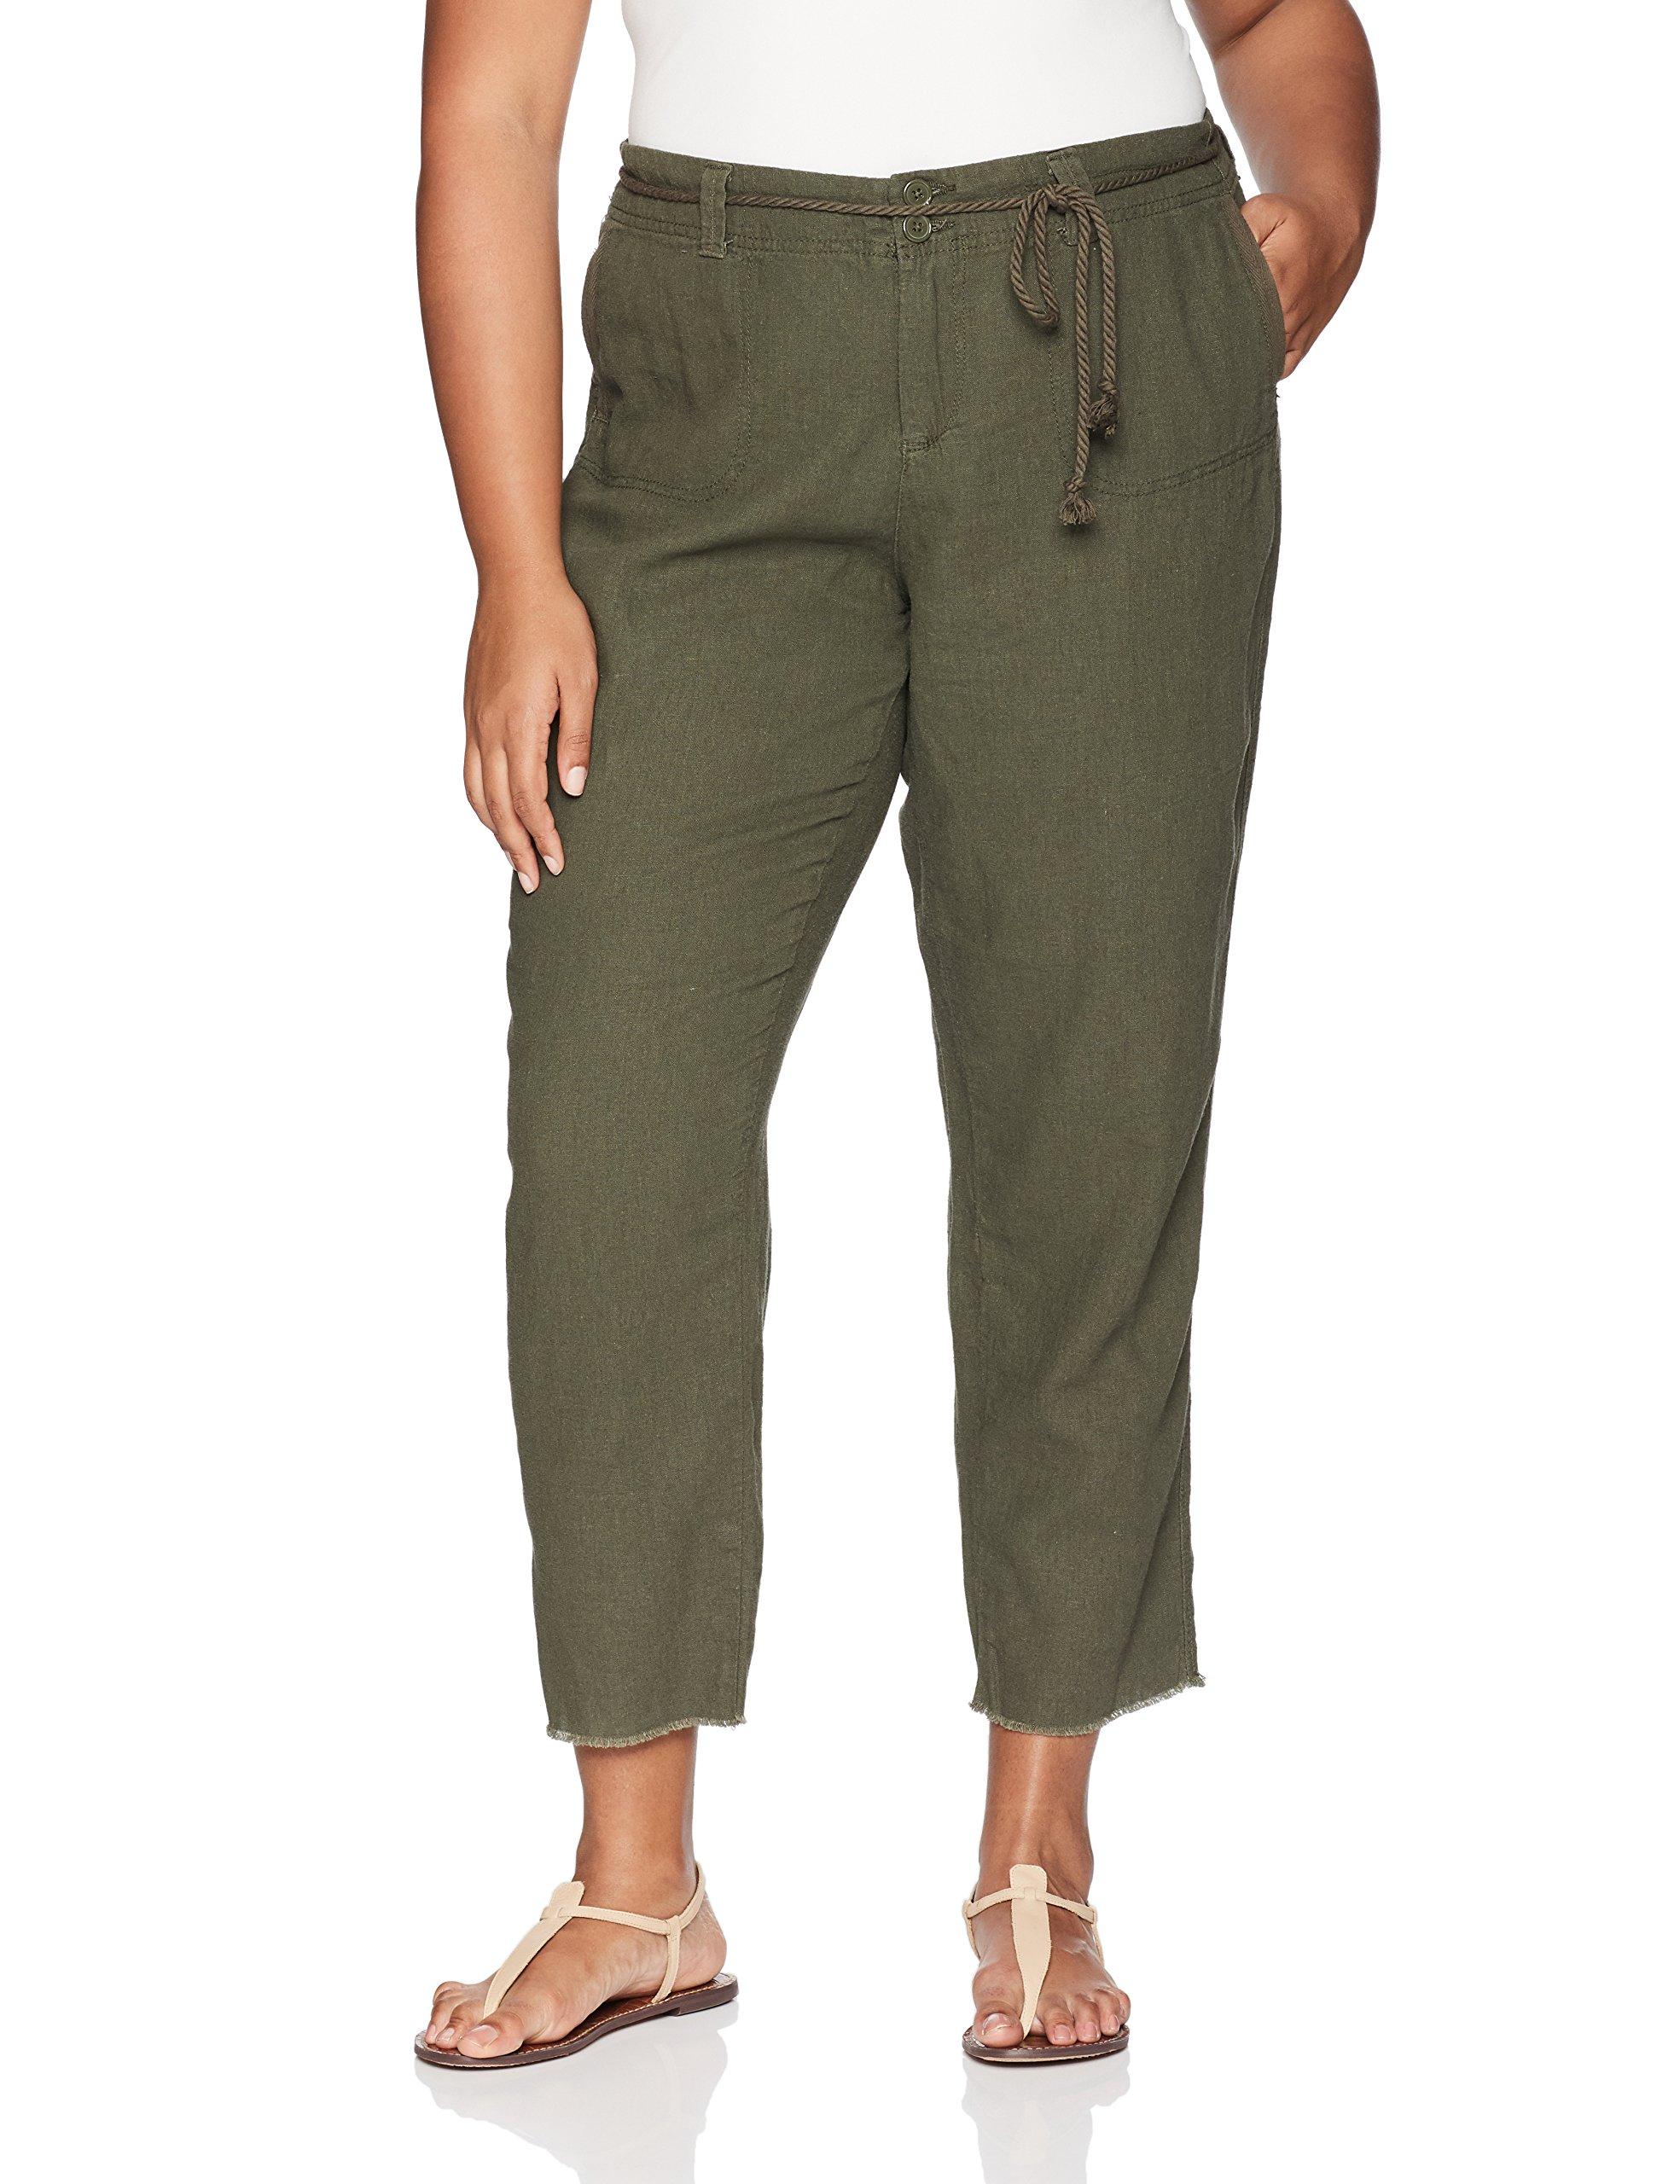 dollhouse Women's Plus Size Linen, Army Green, 16